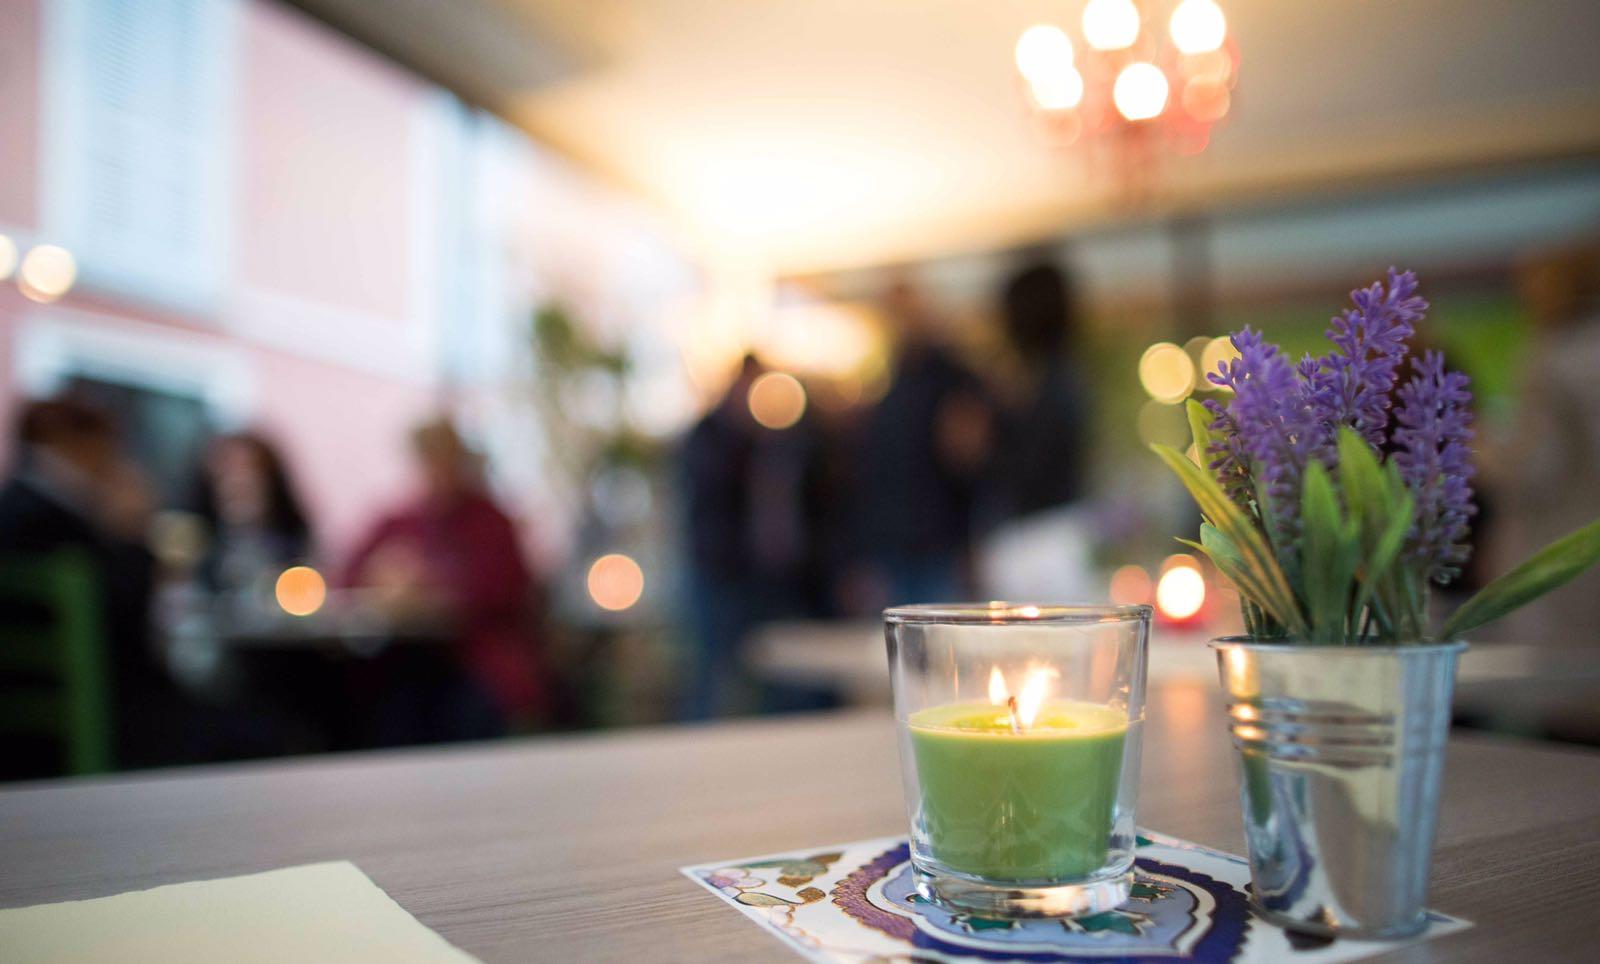 Tavolino con candela verde accesa sopra